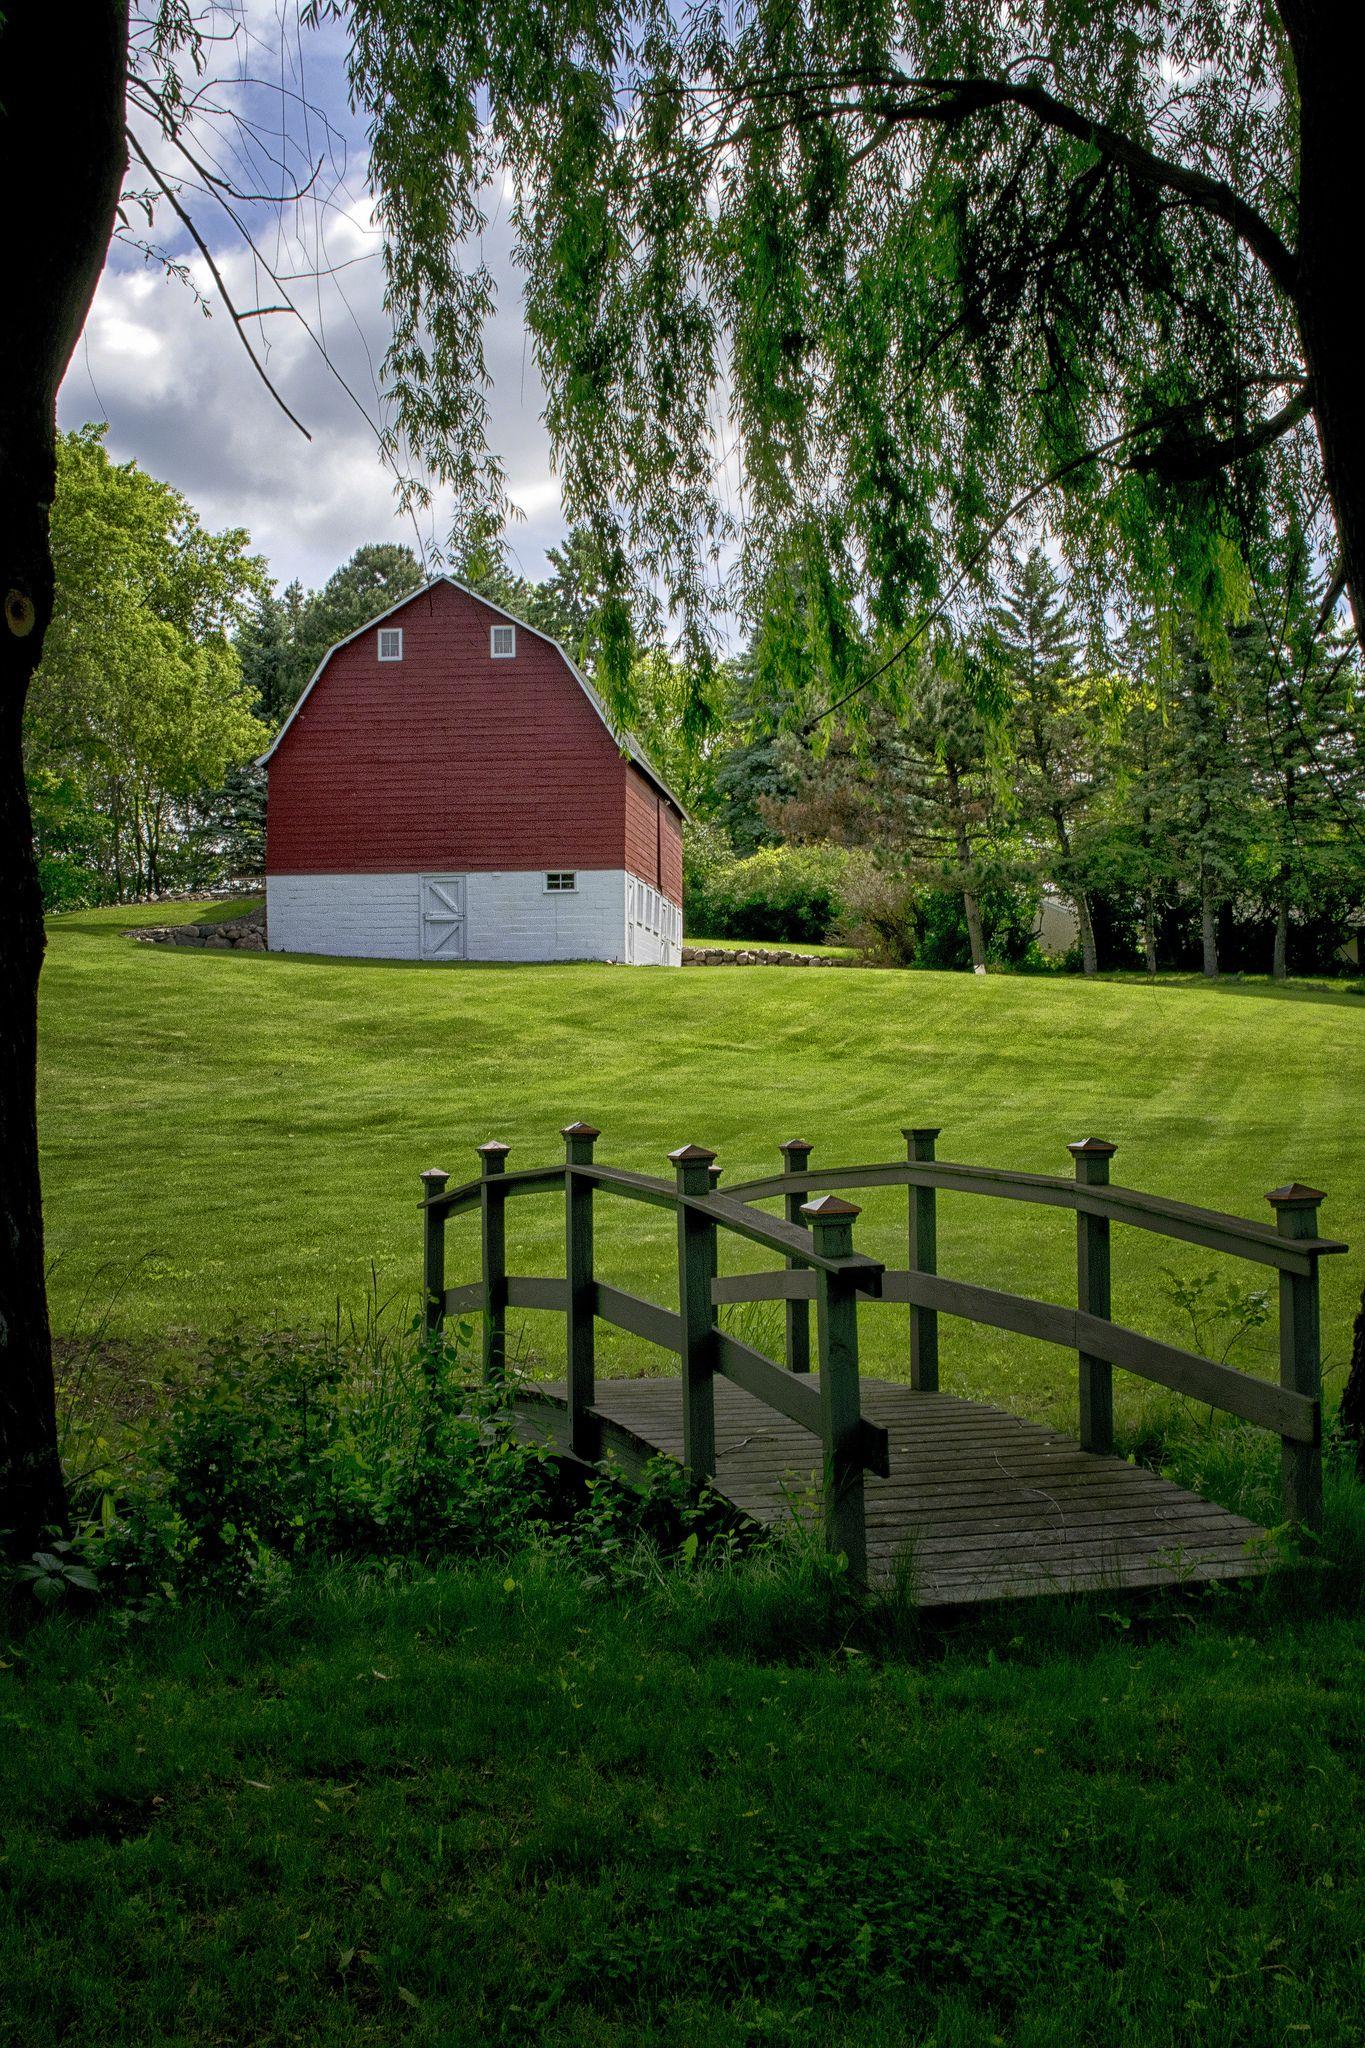 https://flic.kr/p/HEJ7kM | Bridge to the Barn | A beautiful scene of small bridge leading to a well kept barn on a hill.  Located near Hackamore Road & Brockton Lane N. in Corcoran, MN.